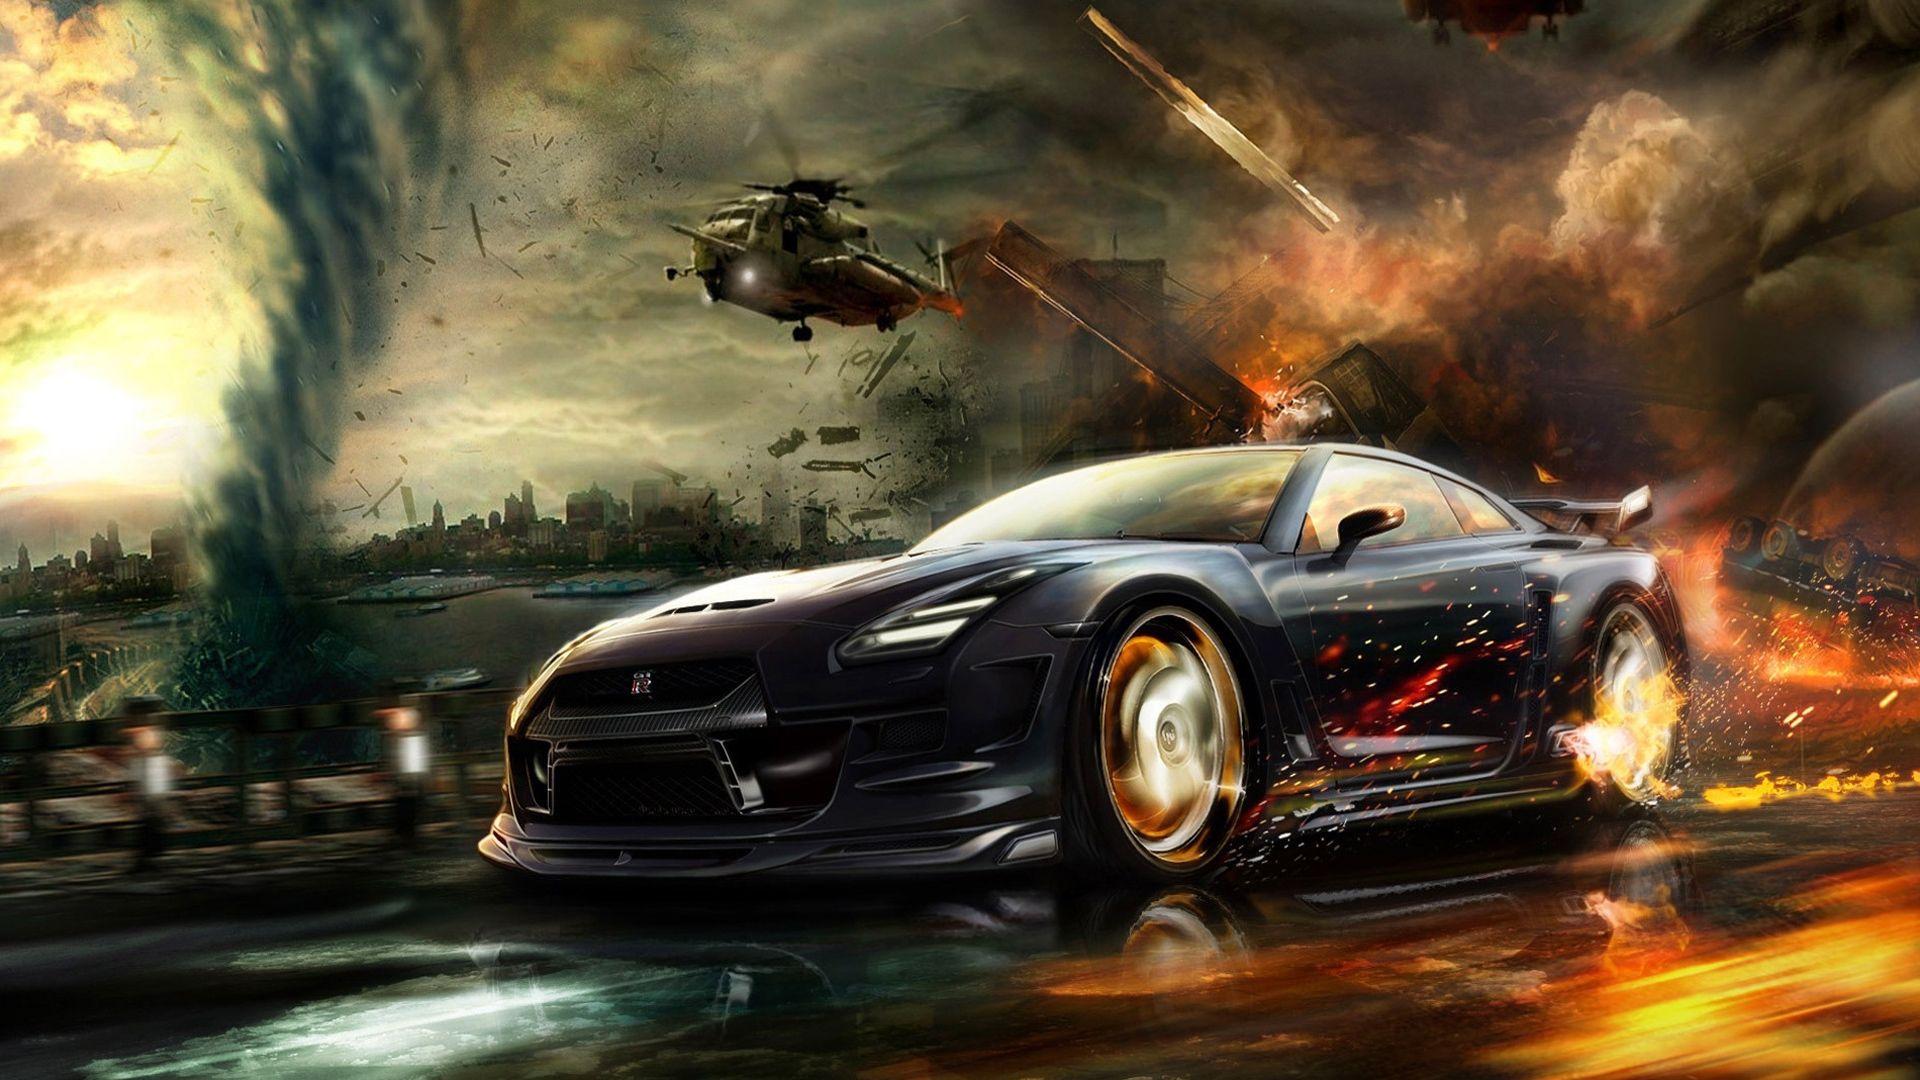 Racing Cars Wallpaper Mobile Nissan Gt R Carros Com Estilo